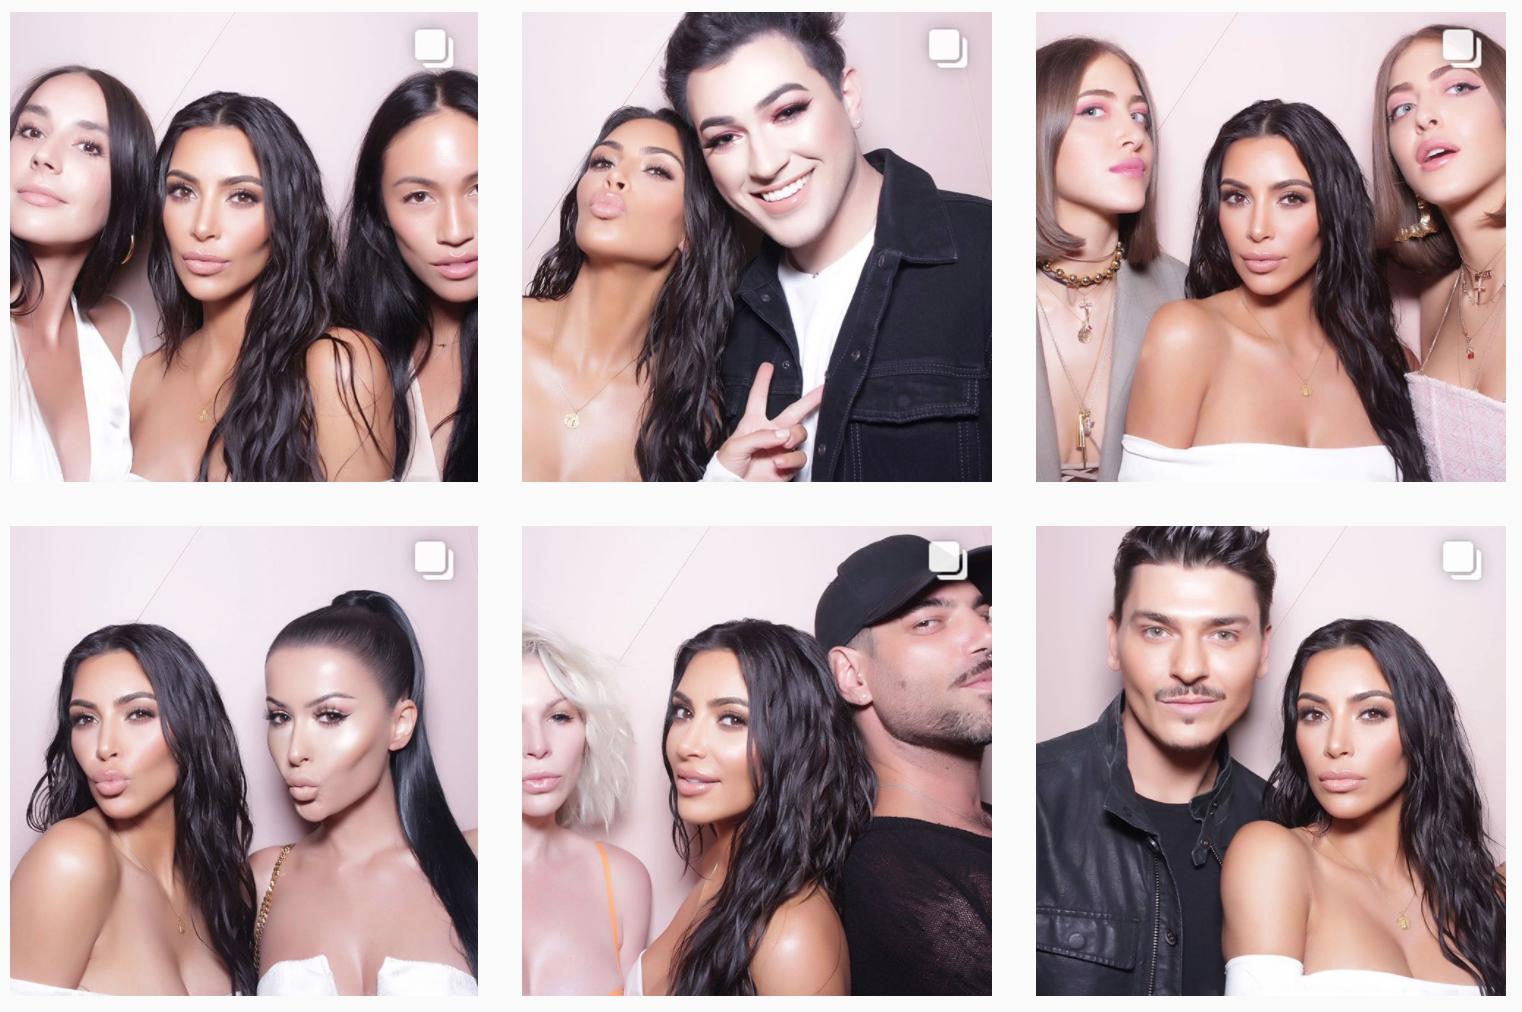 Kim Kardashian on Instagram